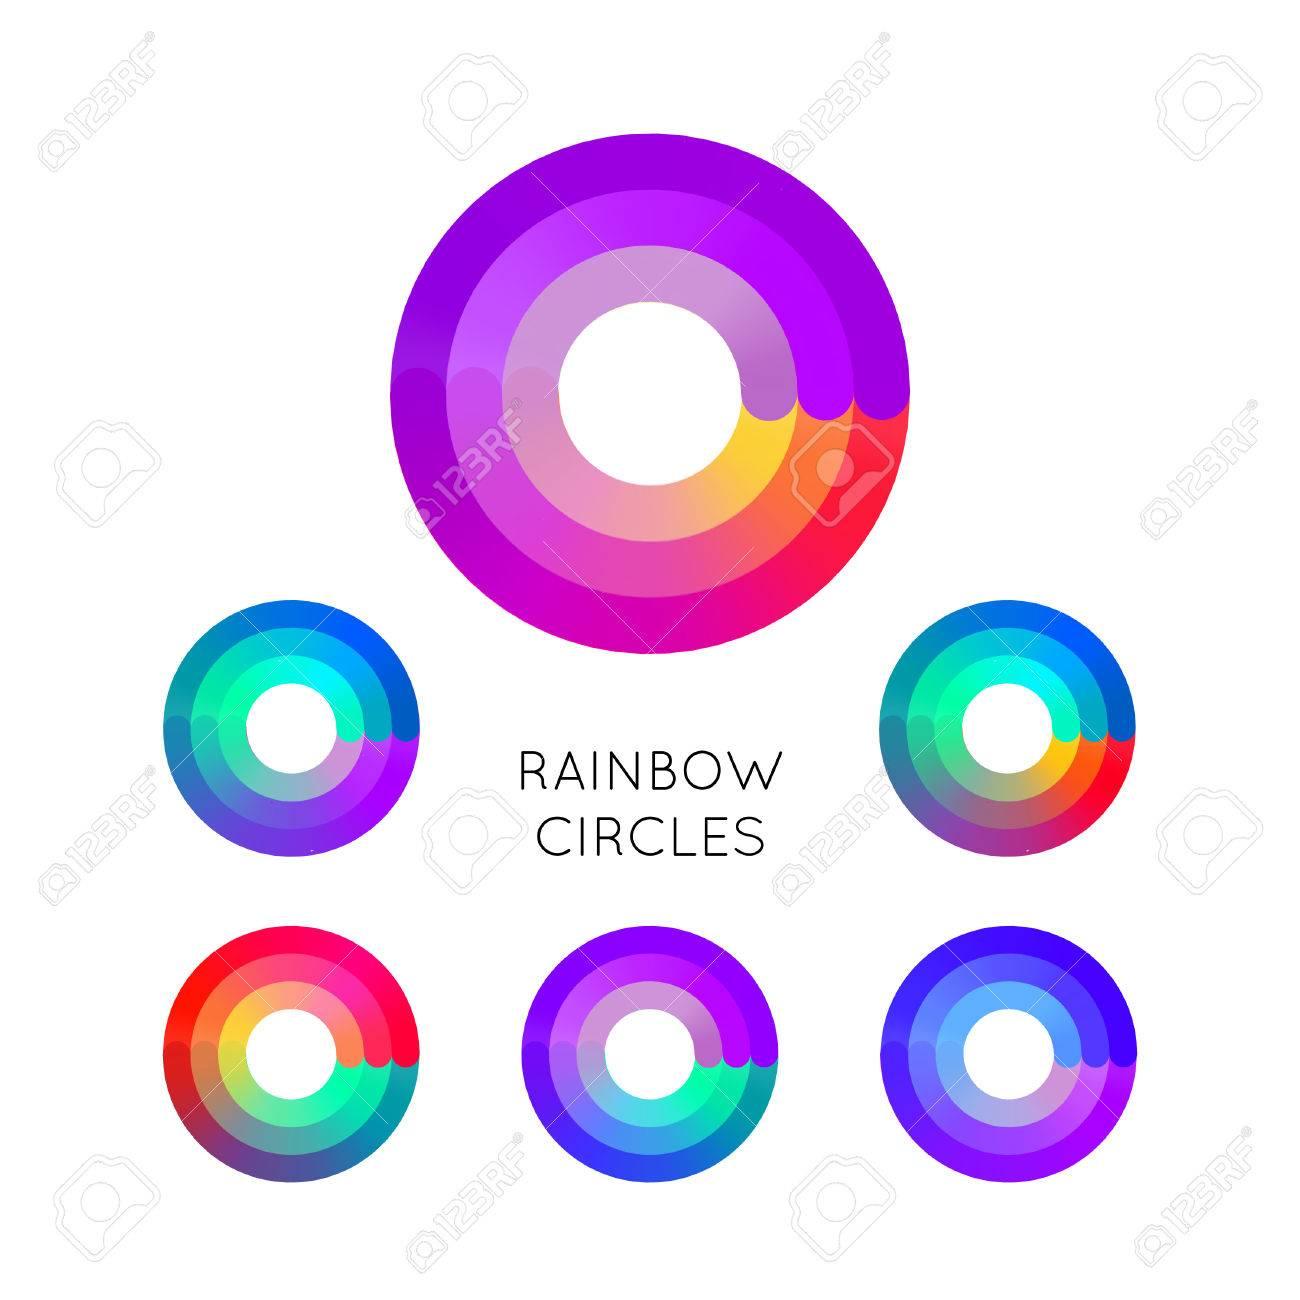 Set of Bright Colorful Circle Symbols Isolated on White Background. - 50772837